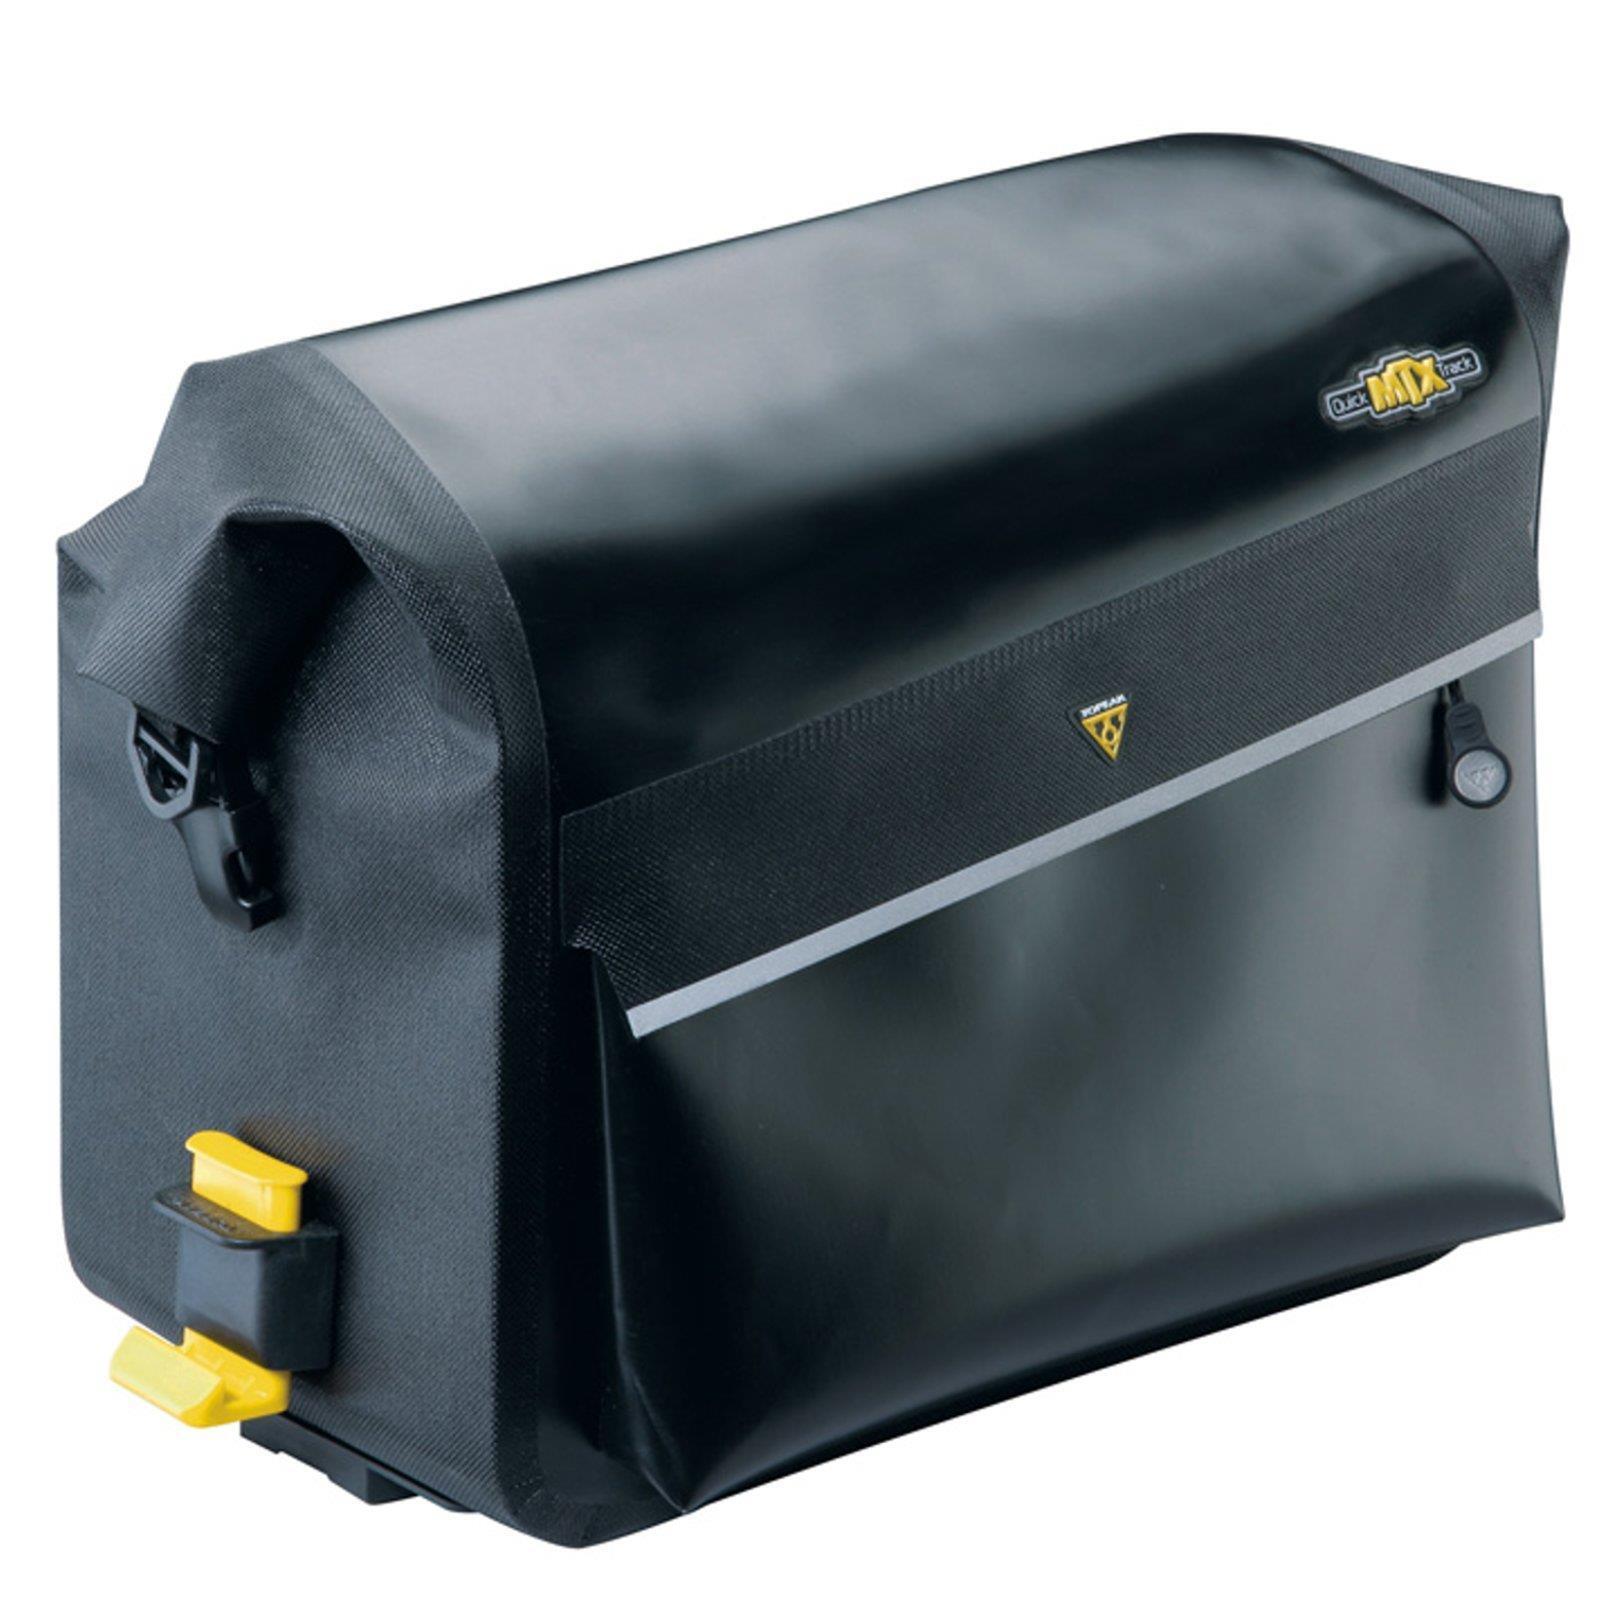 Topeak mtx trunk drybag impermeable portaequipajes sistema bolso bicicleta denso